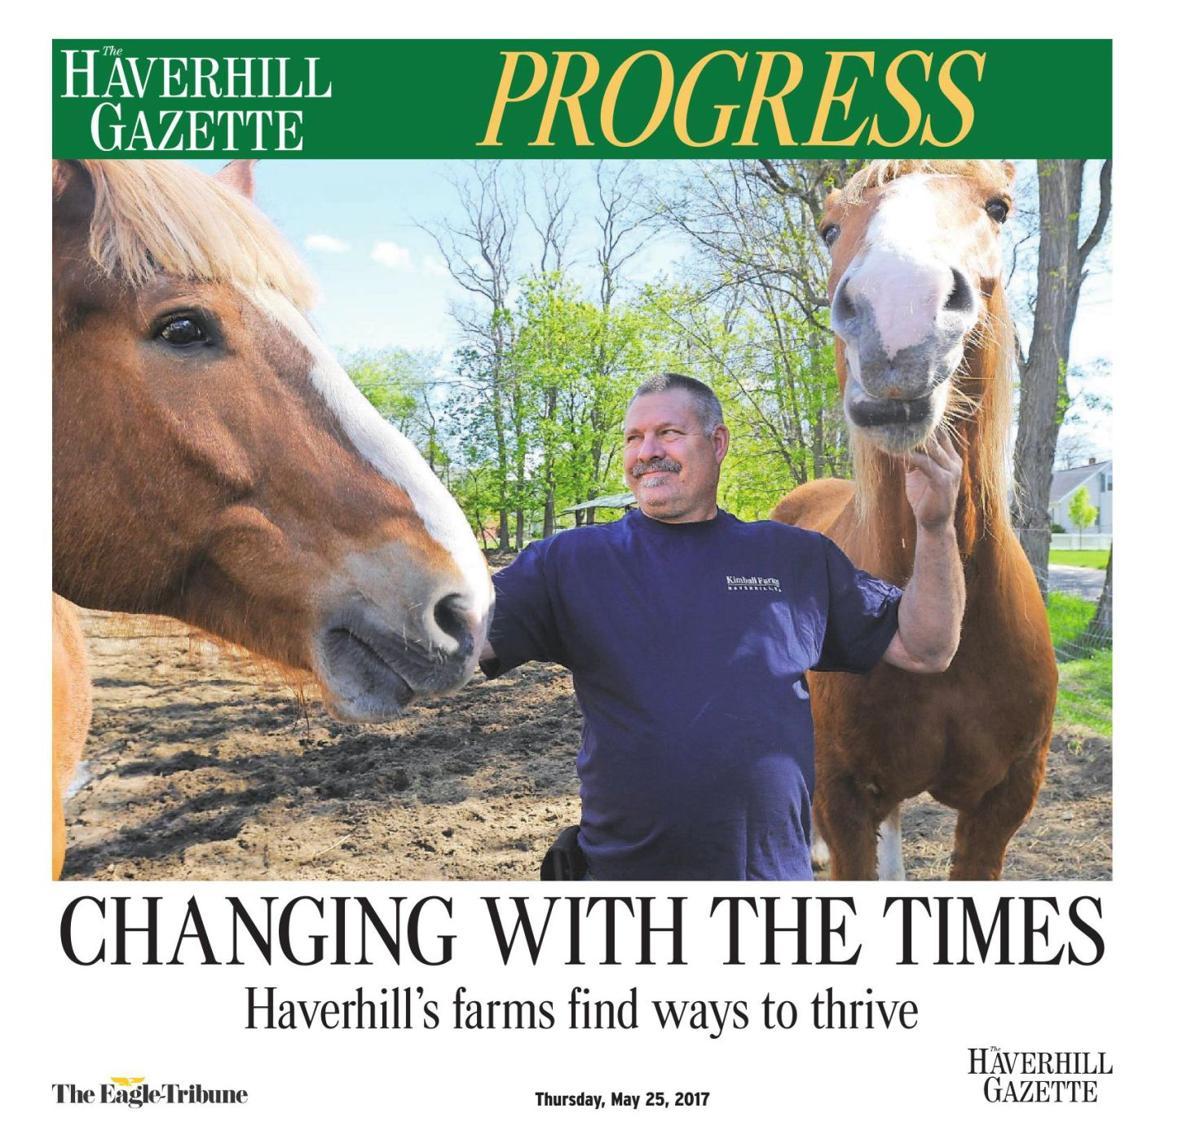 Haverhill Gazette Progress 2017